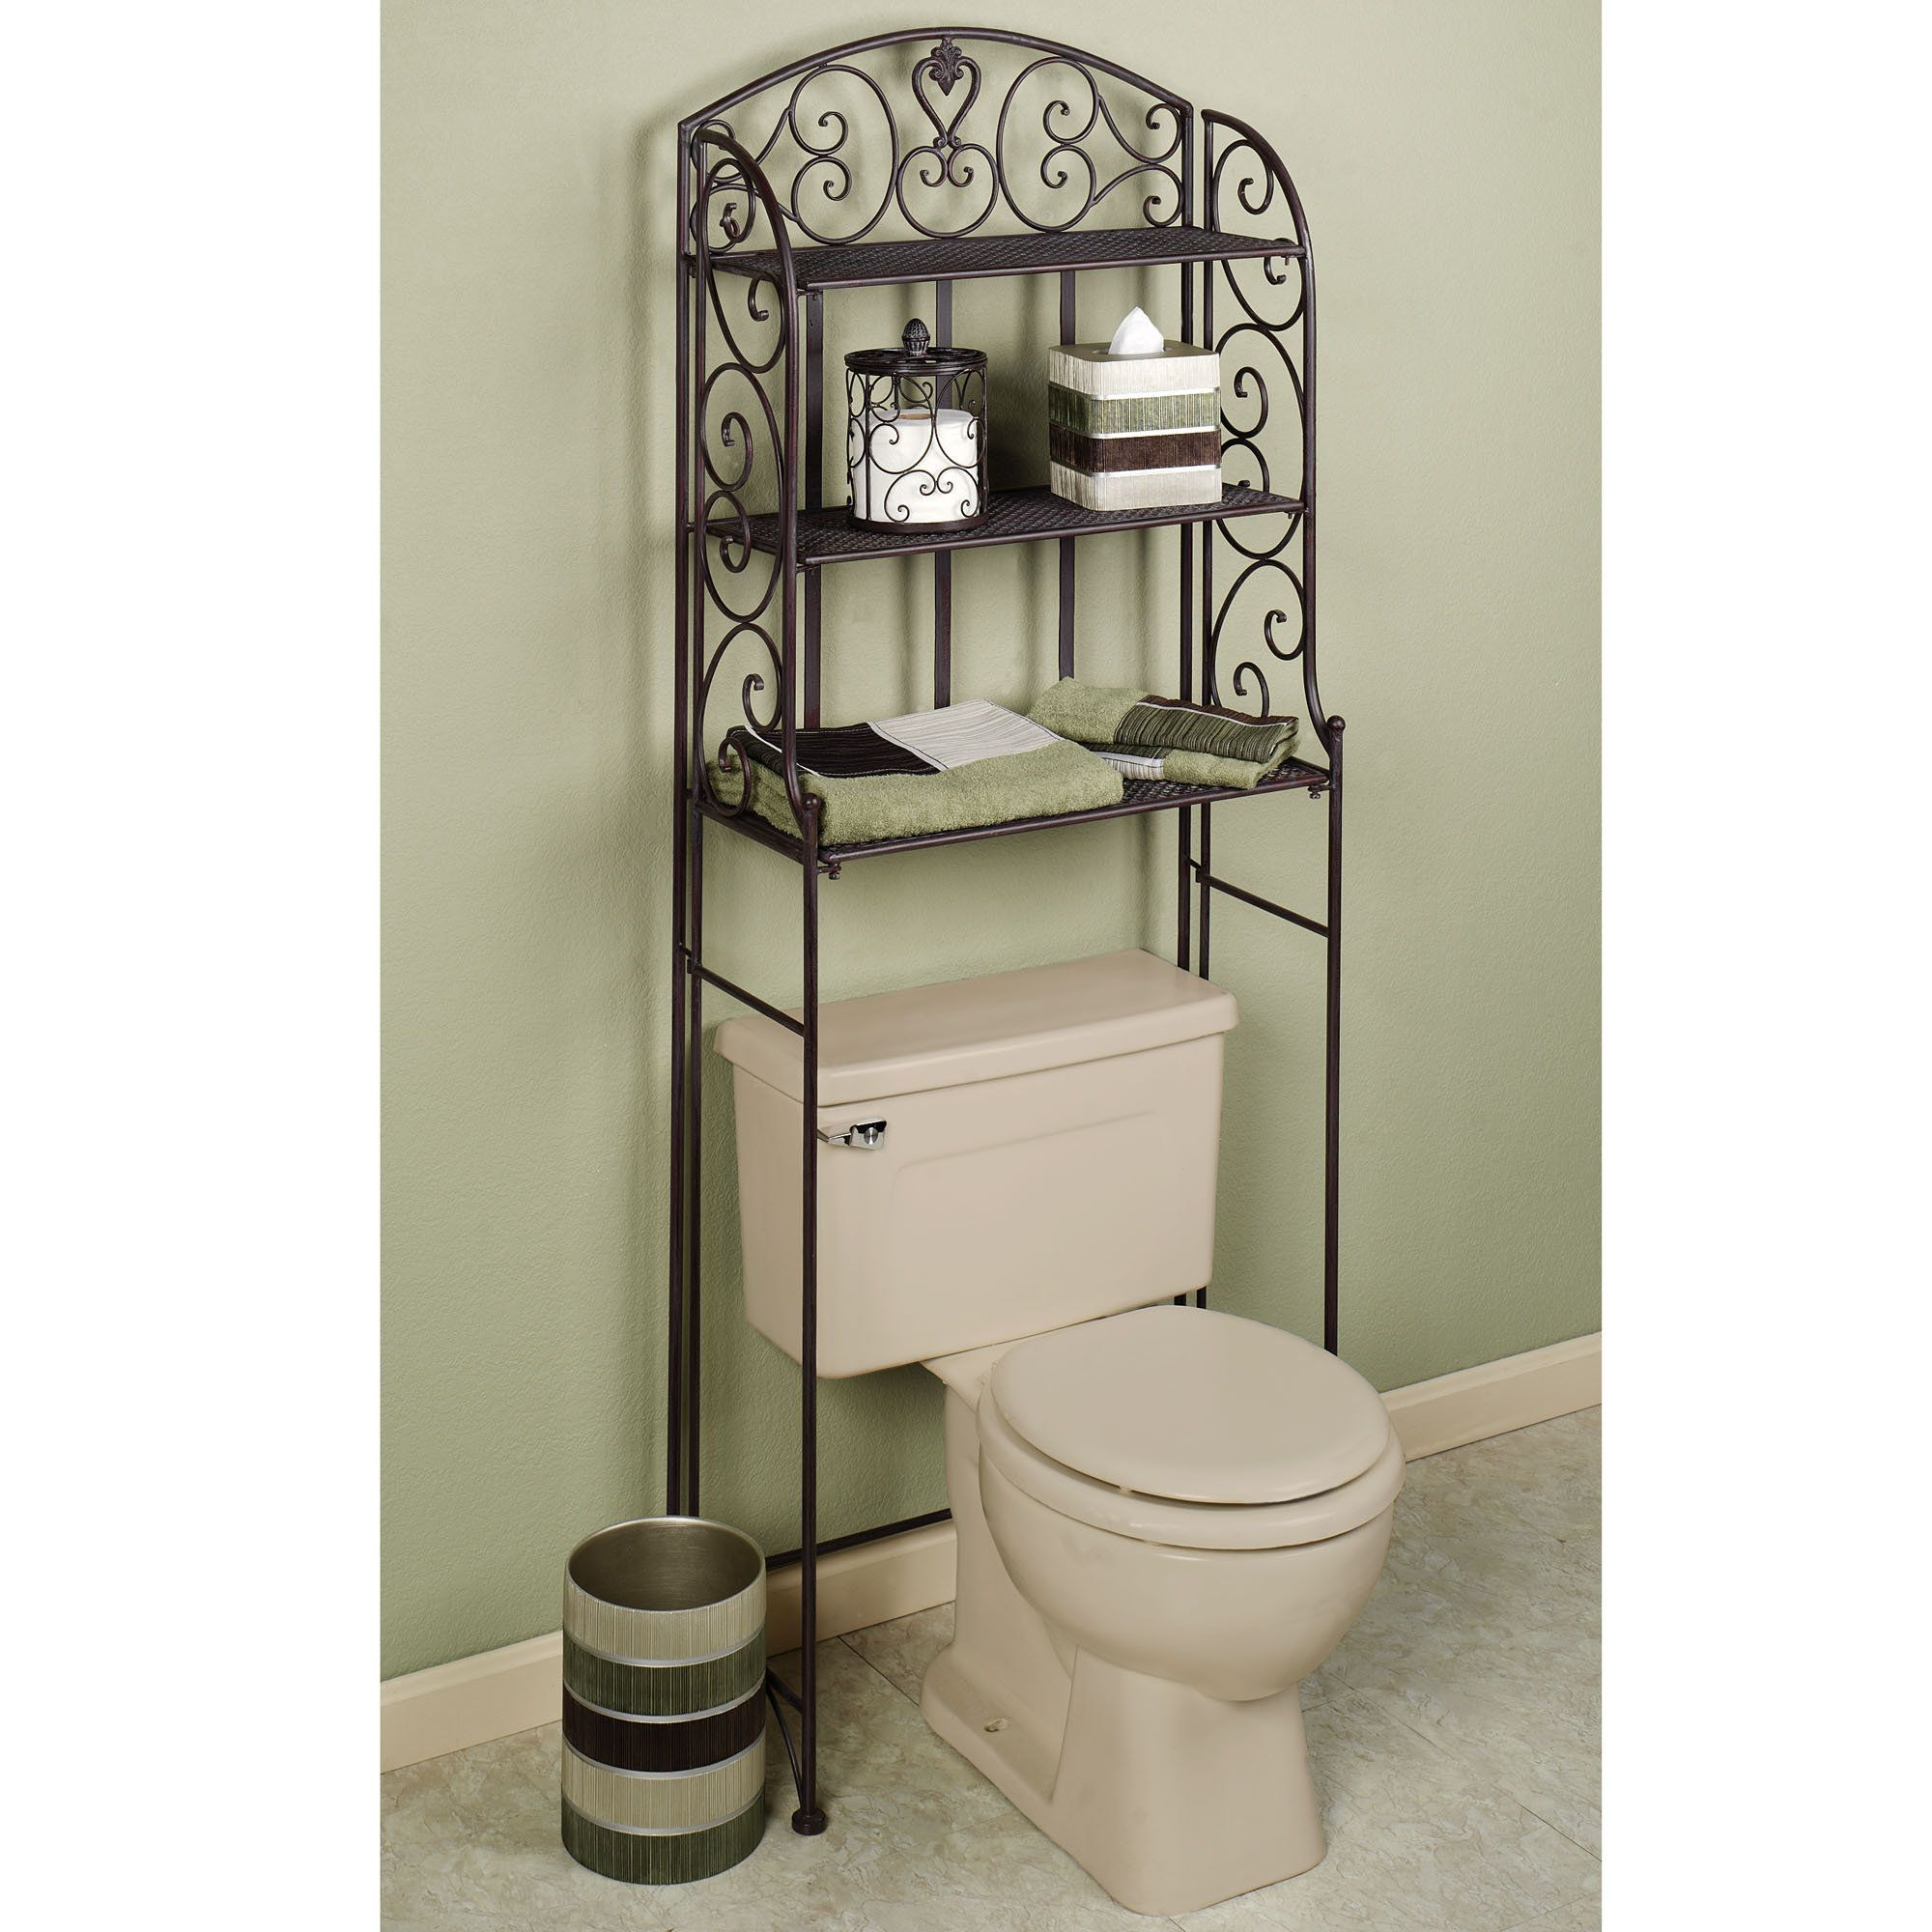 Aldabella Tuscan Slate Bathroom Space Saver